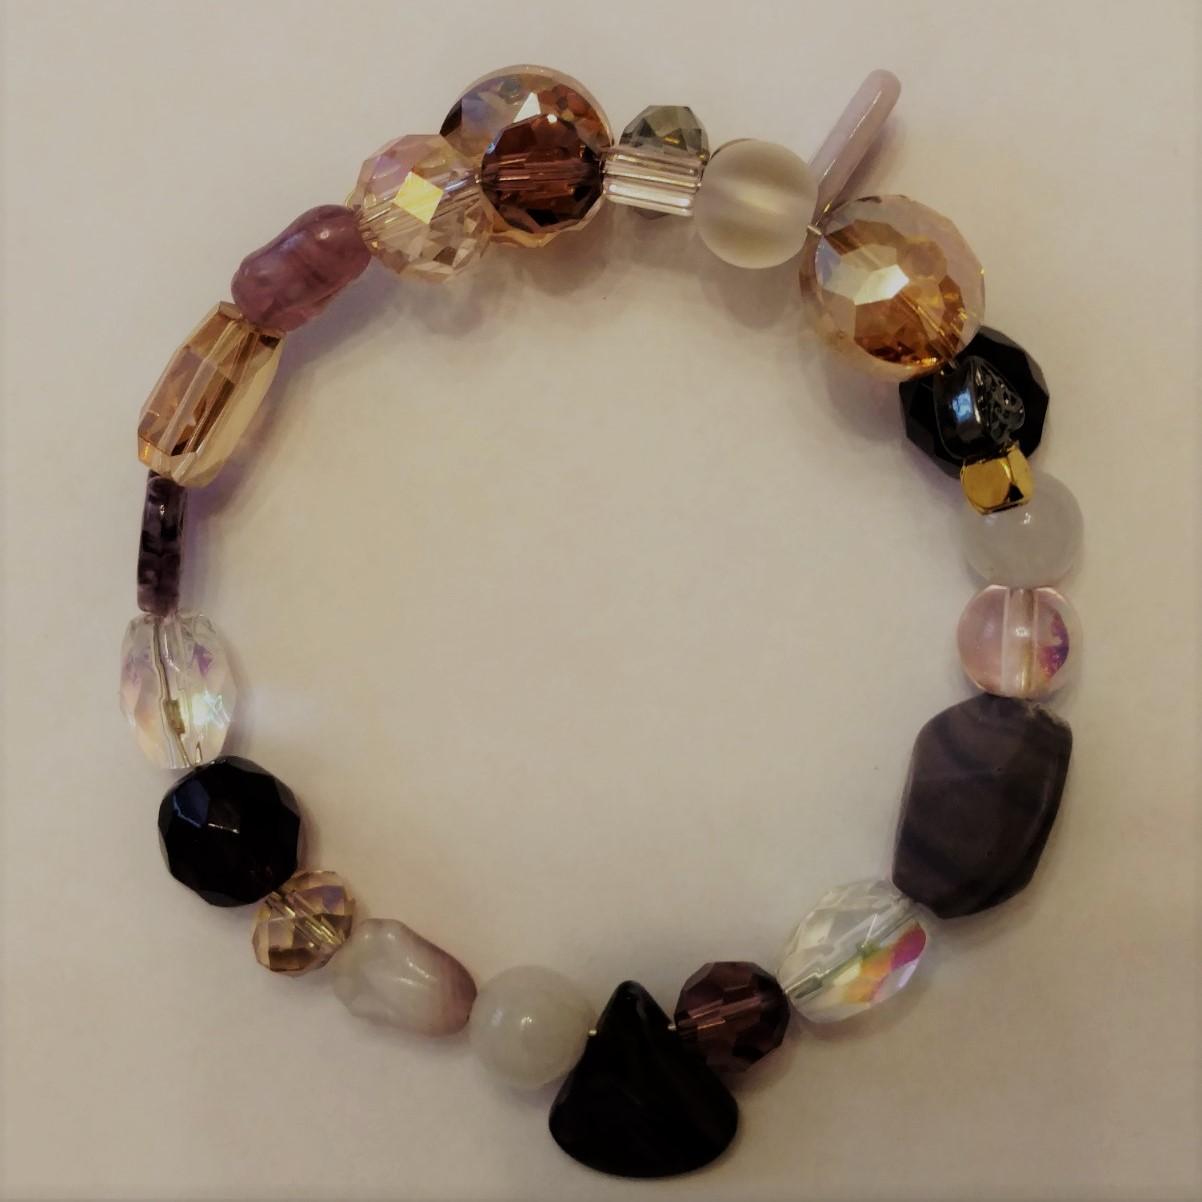 #L&L 181205 Bracelet  Suggested $12 USD